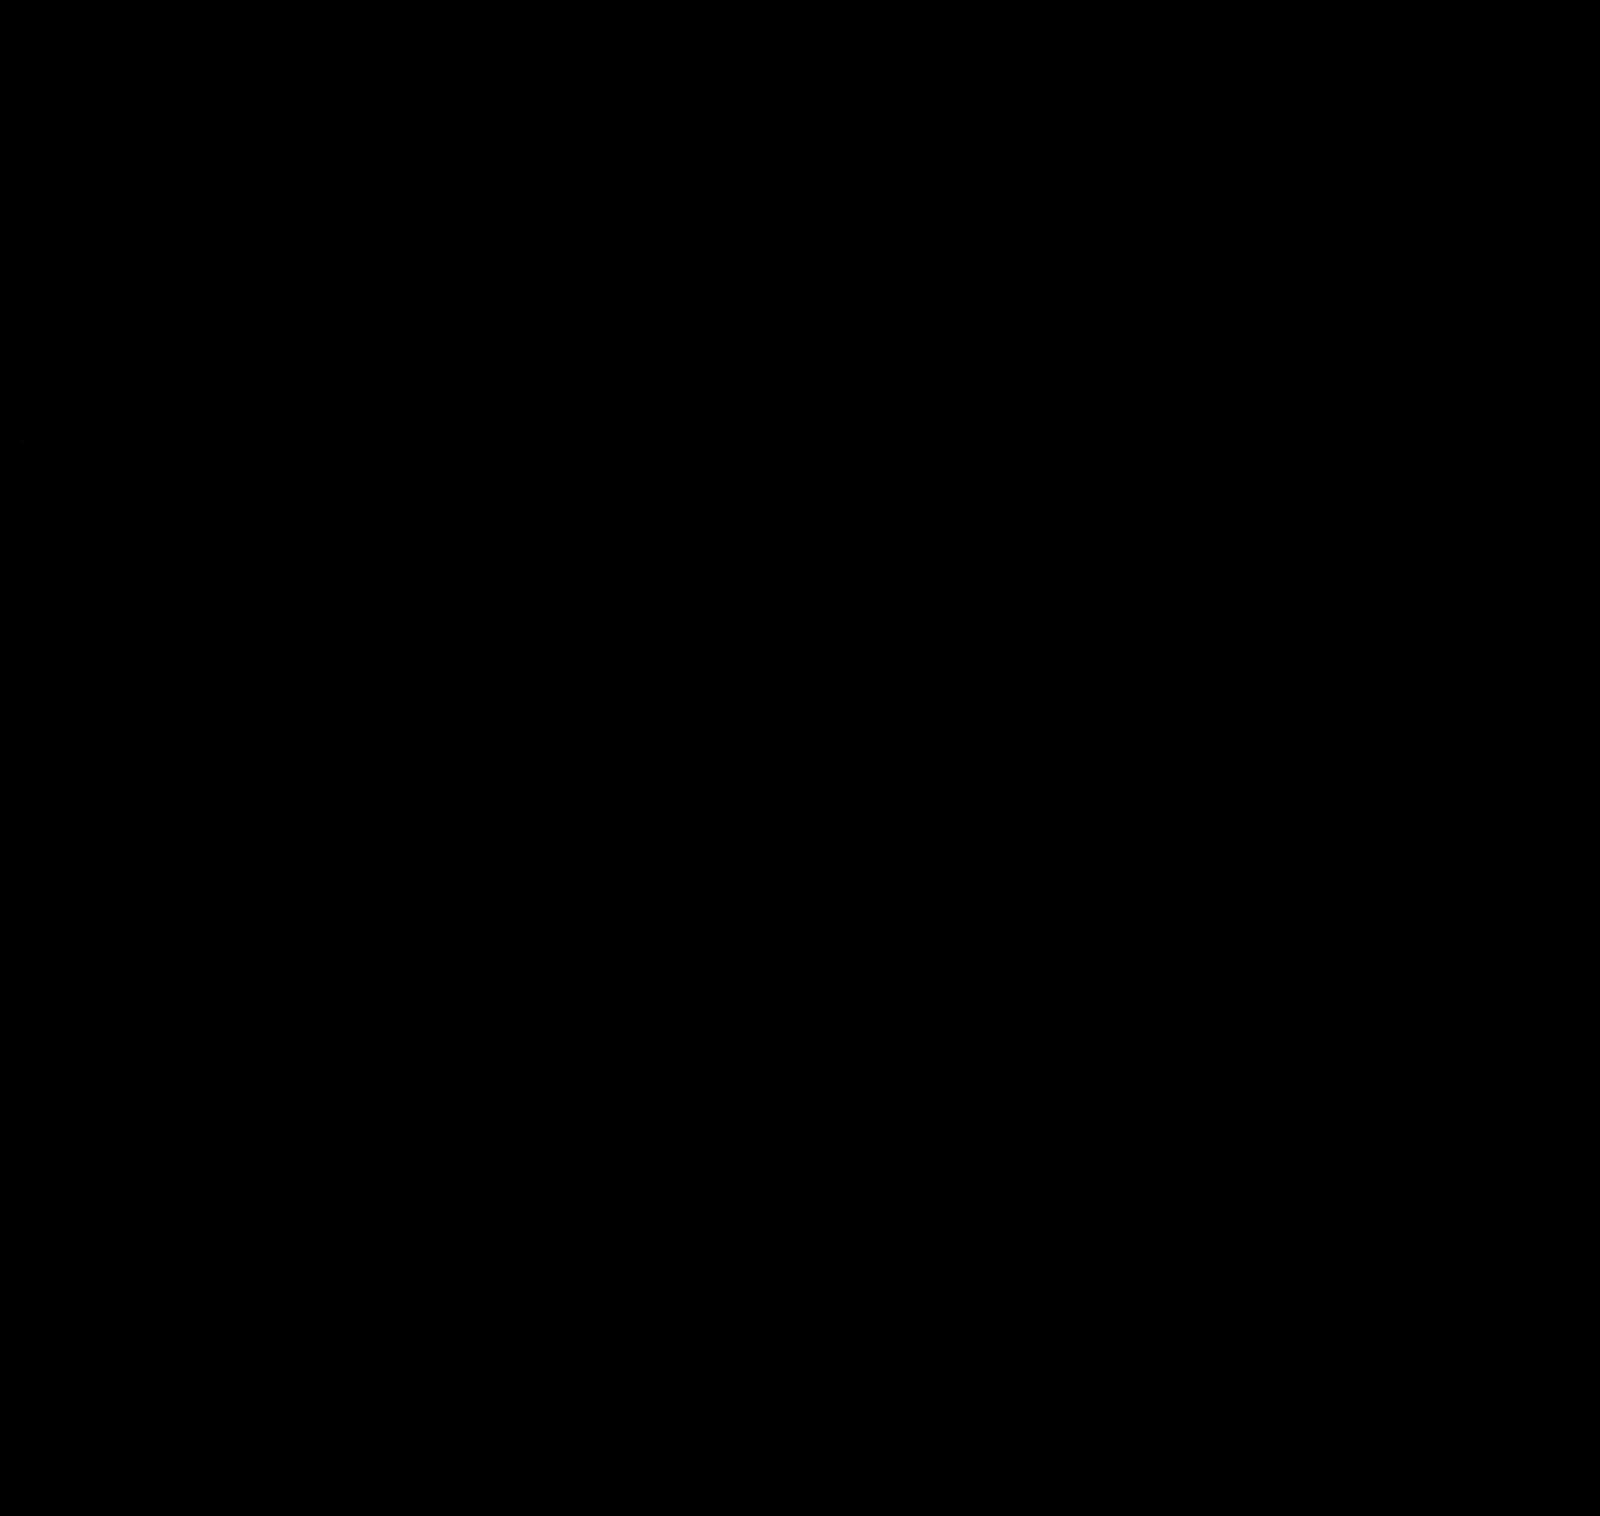 Gallery of Mugshot Background